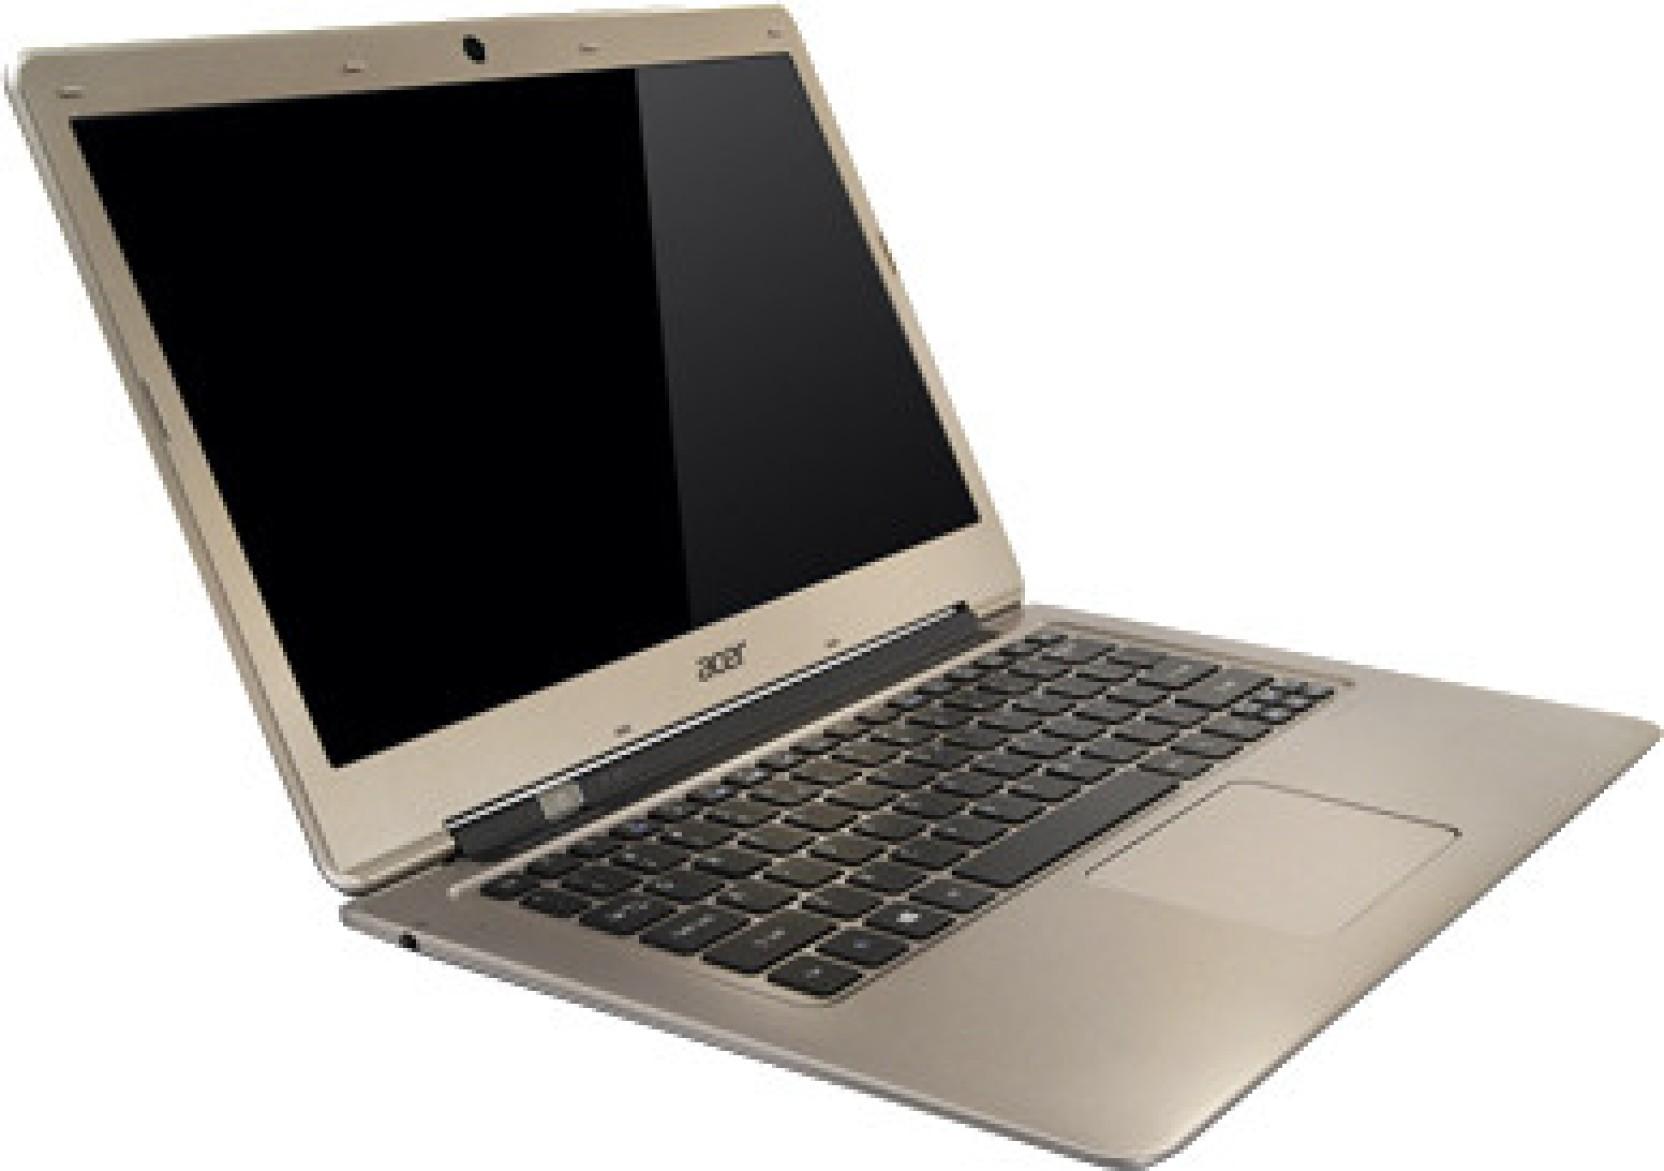 Acer Aspire V5 472P Laptop 3rd Gen Ci3 4GB 500GB Win8